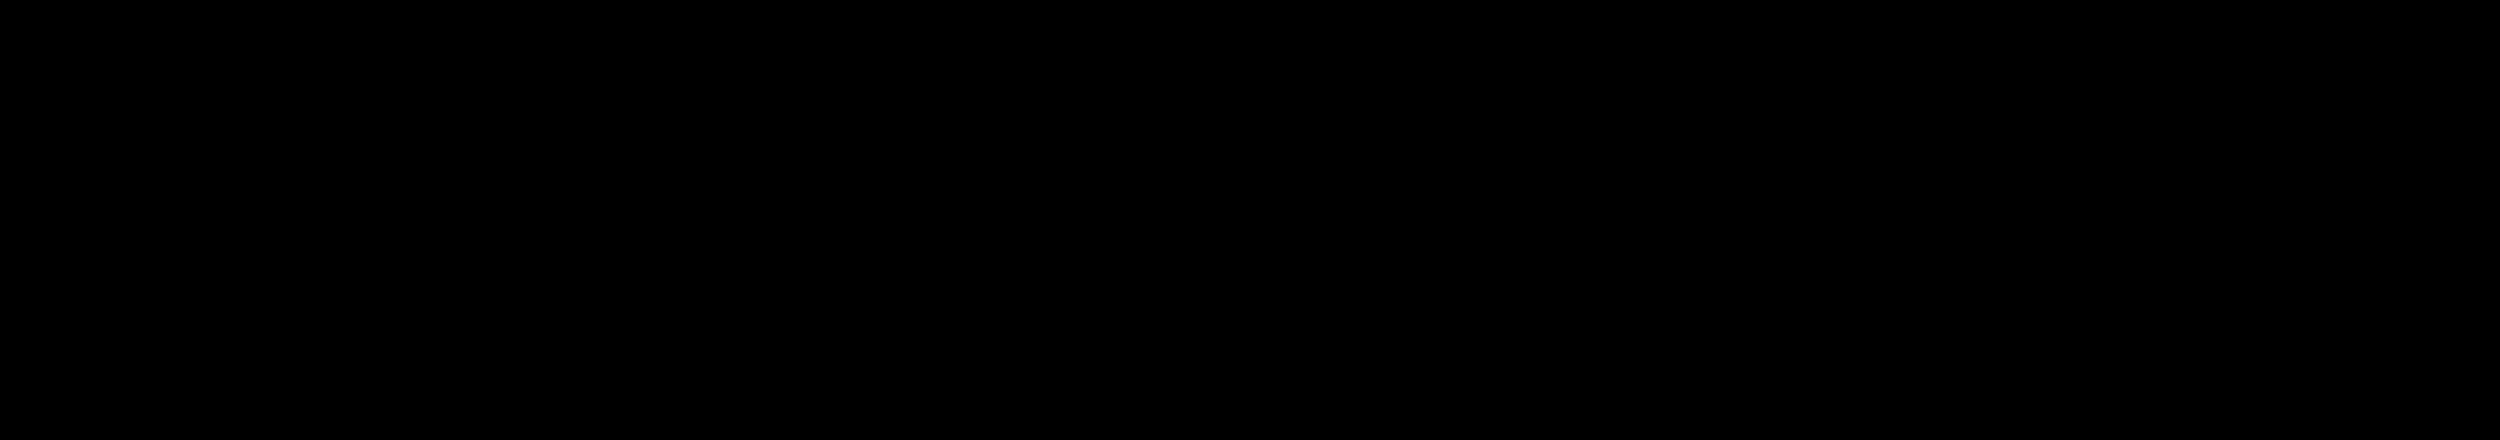 final logo black.png